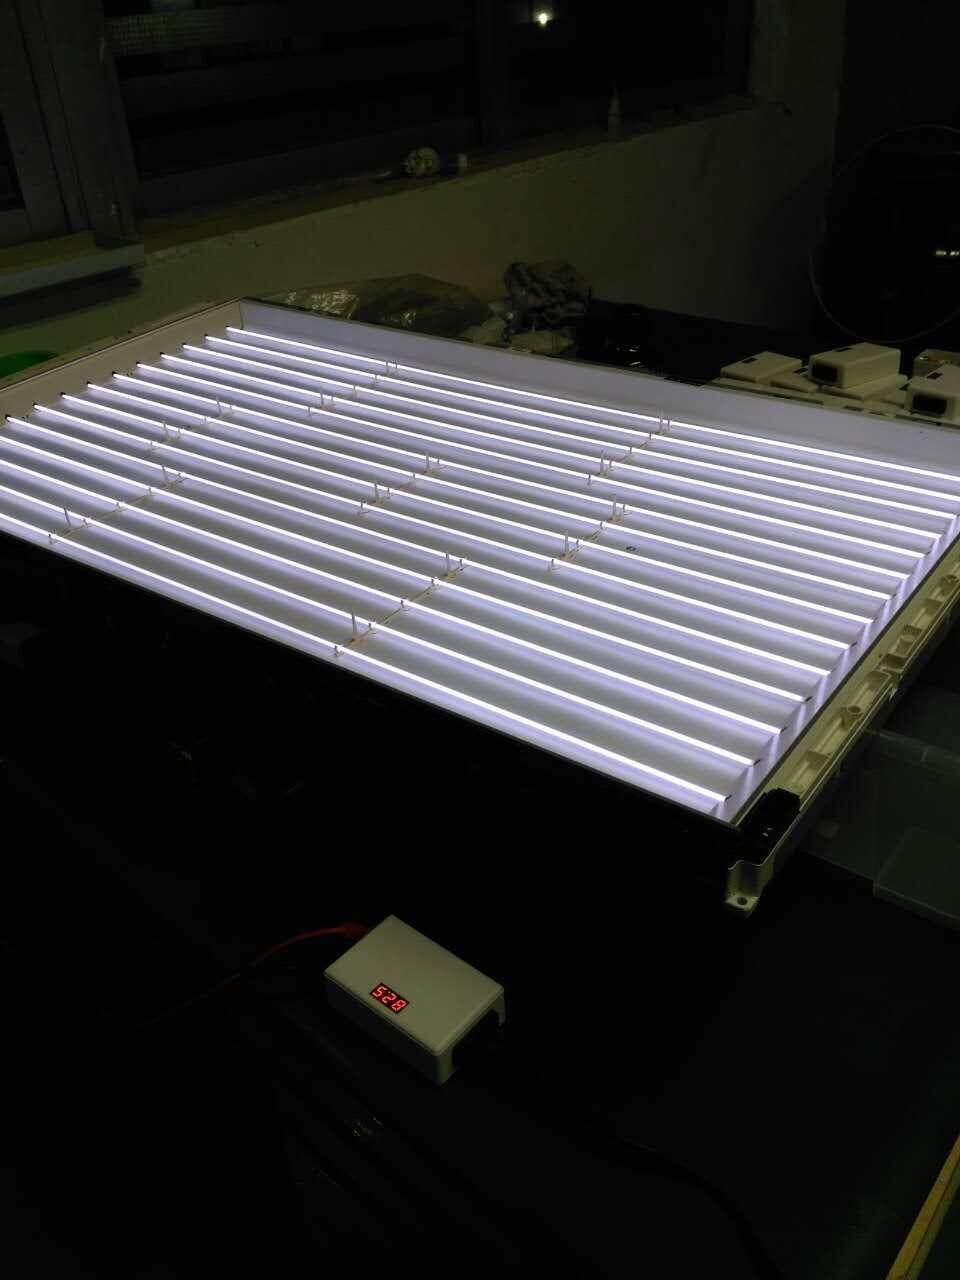 TKDMR Tester per lampada CCFL di tutte le dimensioni TV LCD Laptop - Strumenti di misura - Fotografia 3